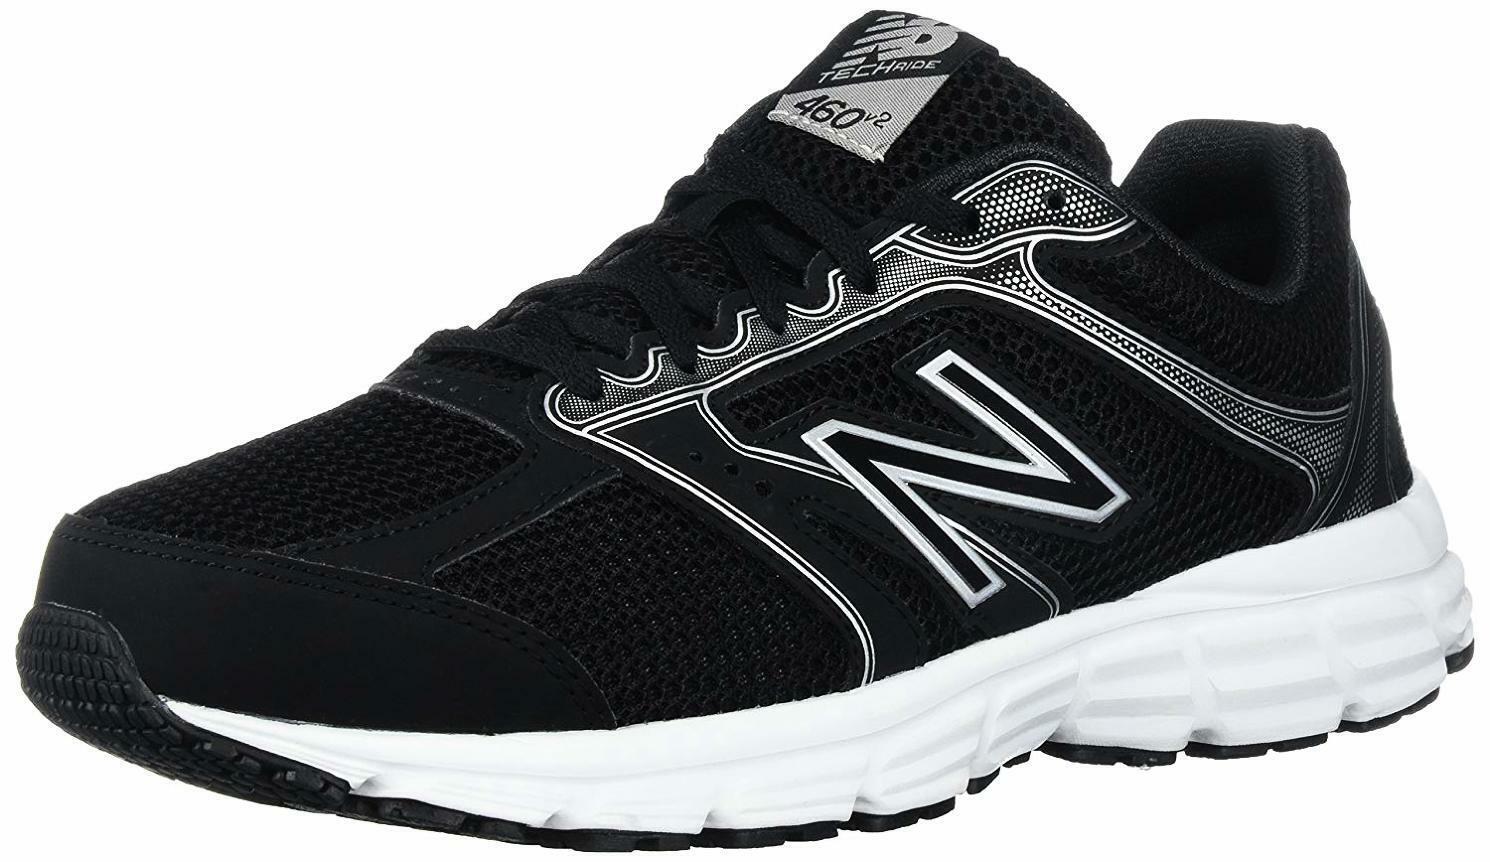 New Balance Men's 460v2 Cushioning Running shoes - Choose SZ color